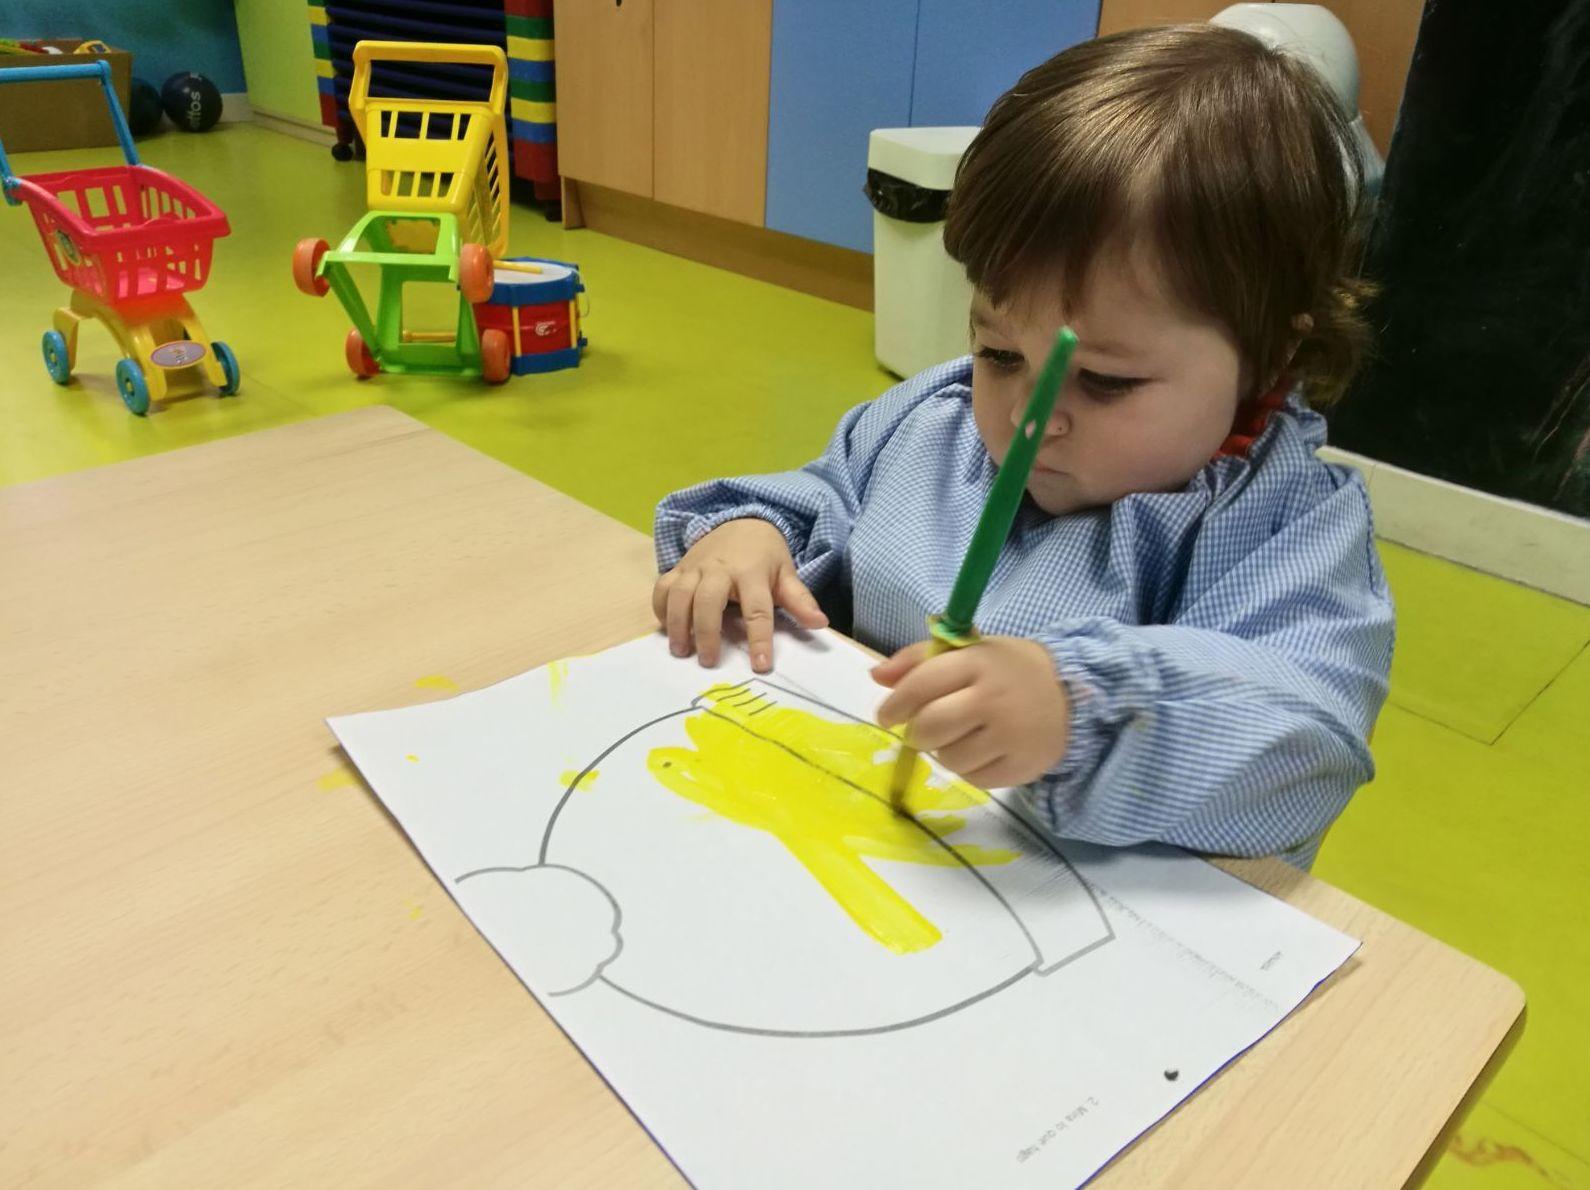 Foto 21 de Escuela infantil en Algete | E.I. Cuatro Pecas de Colores